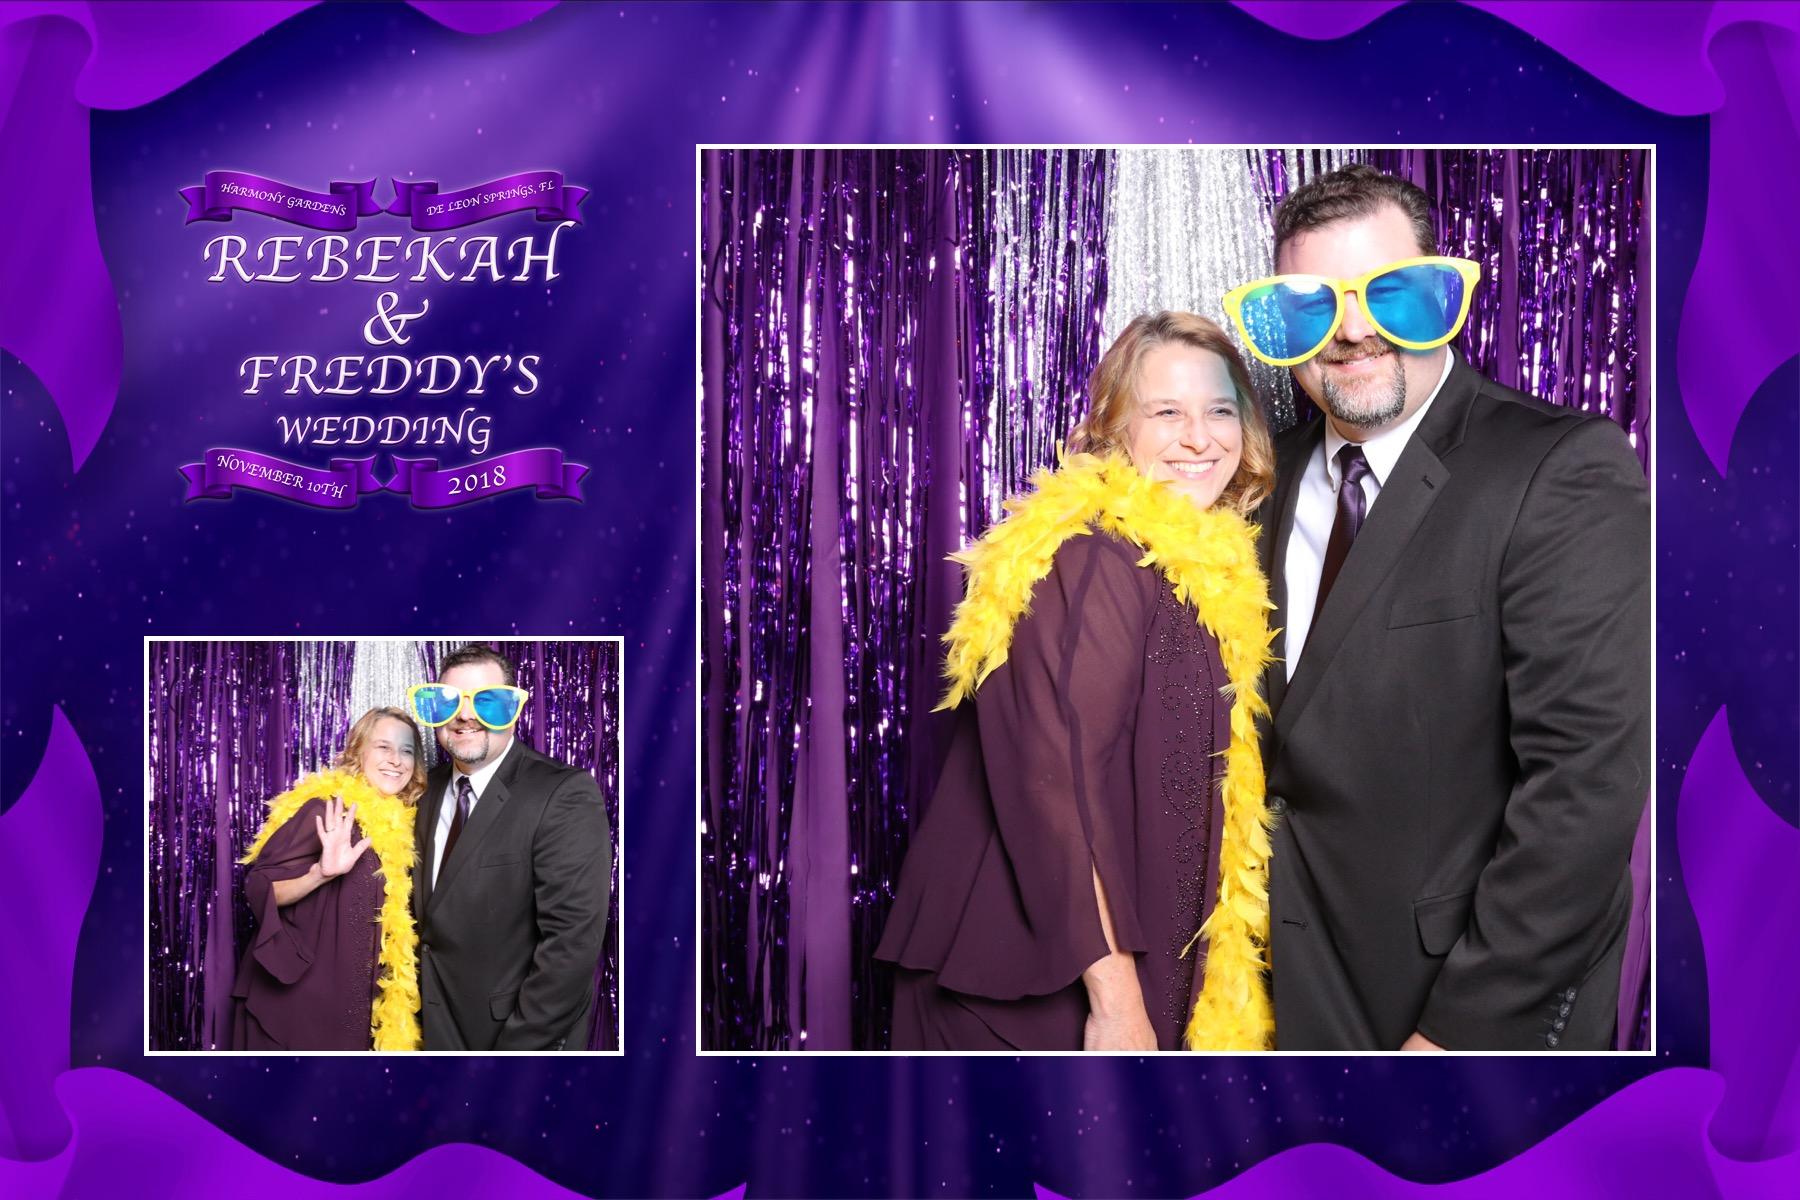 Booth Chamber Photo Booth Harmony Gardens wedding antoine Hart de leon springs_6 (1).jpeg